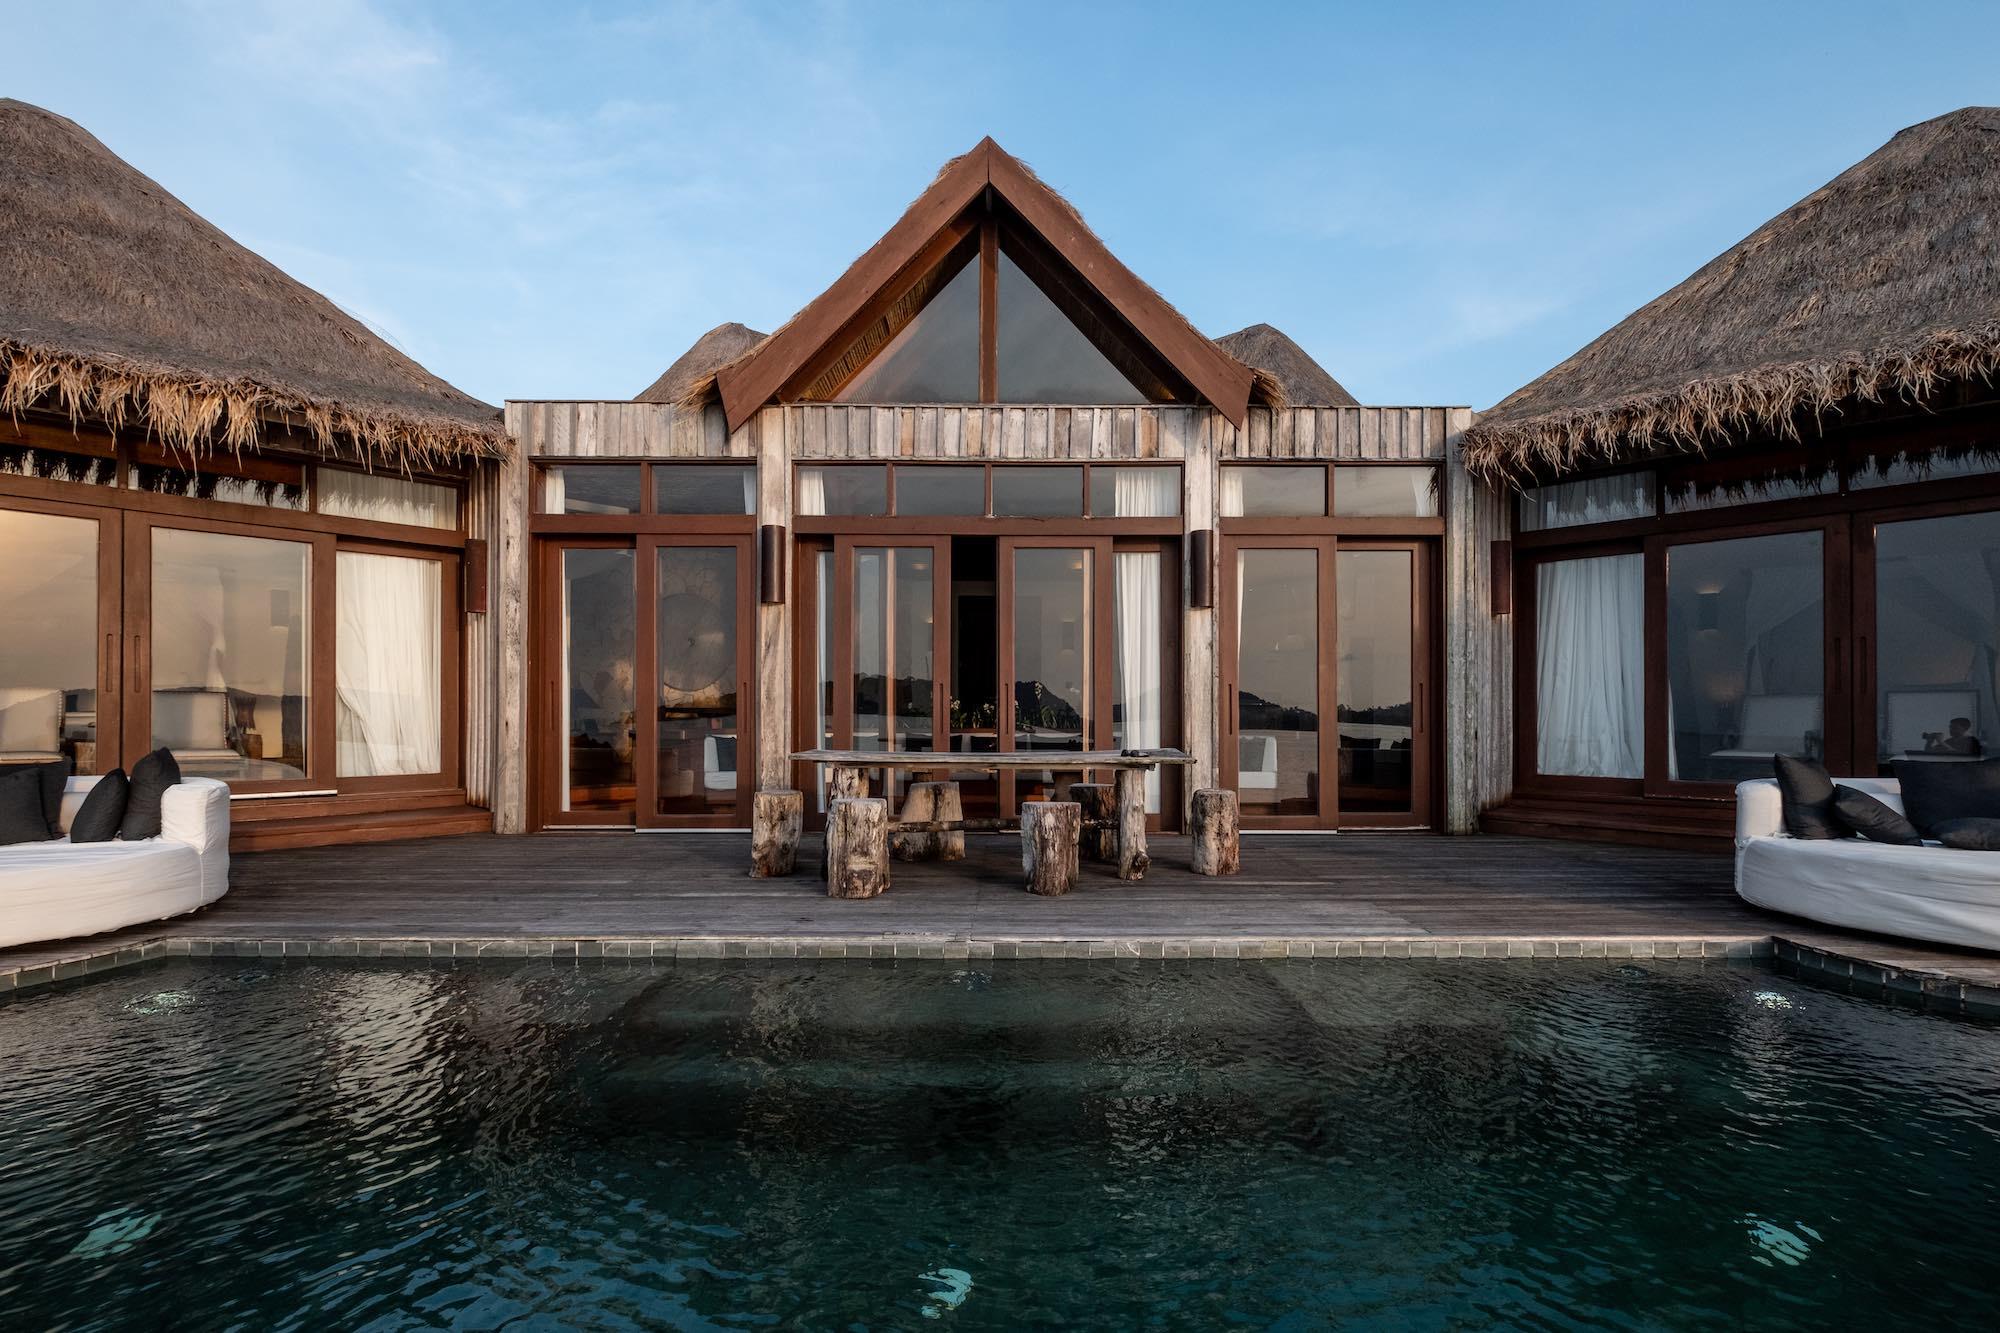 Hospitality Photography Cambodia Asia Interiors Hotel Singapore Coco Creative Studio 58